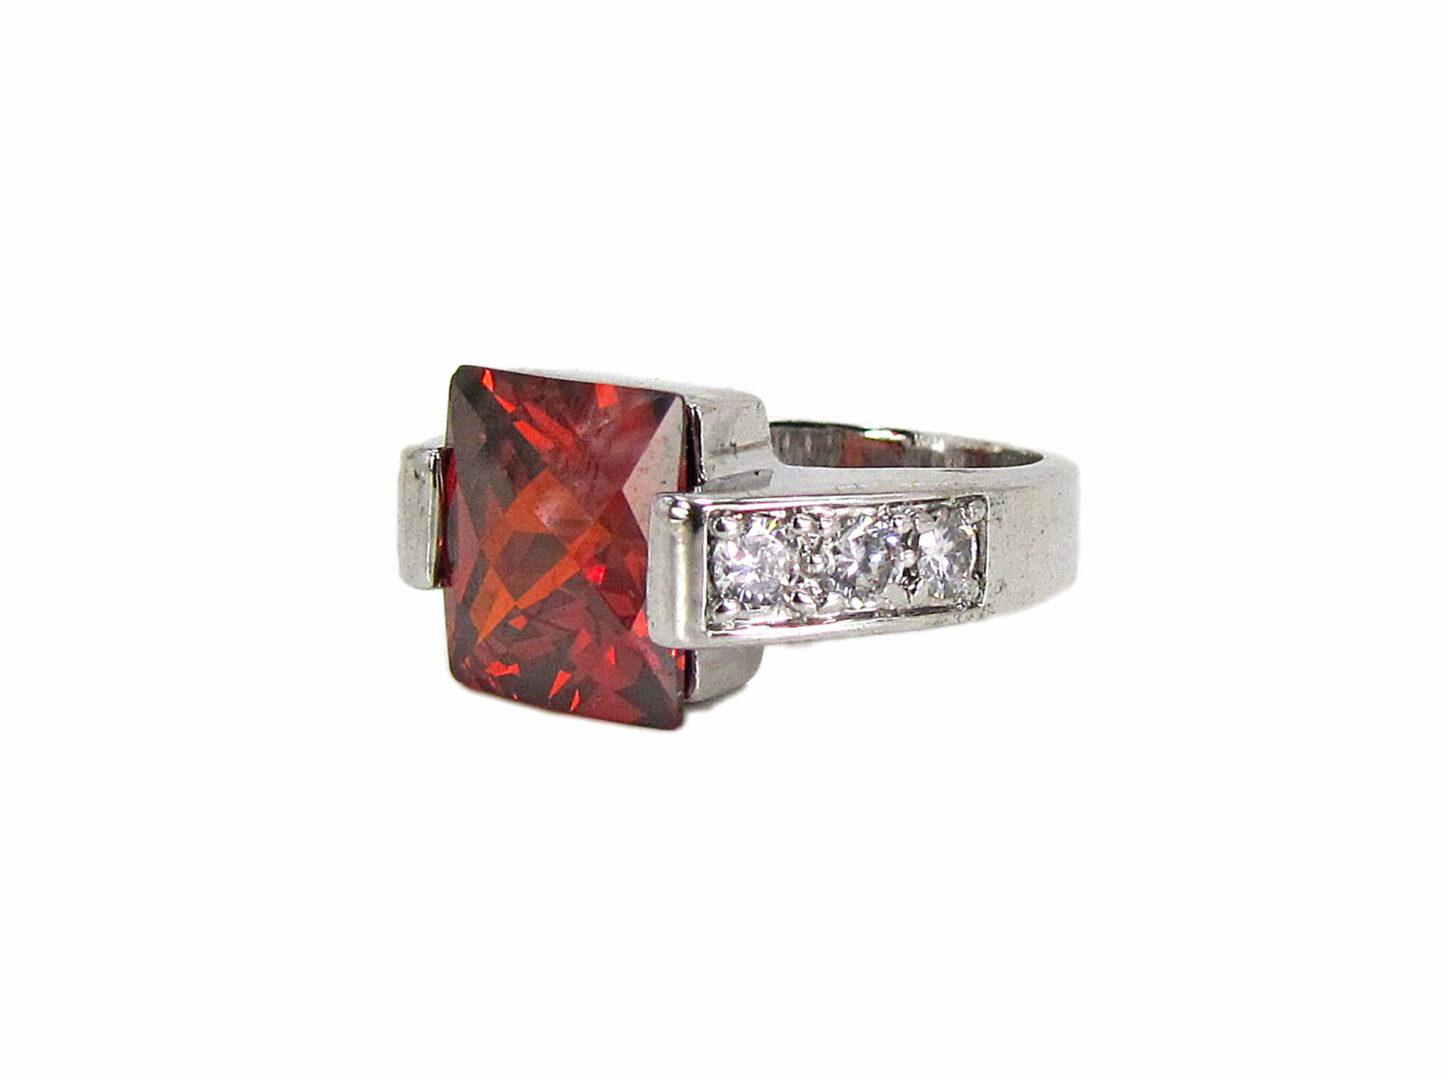 ring with square-cut garnet gem